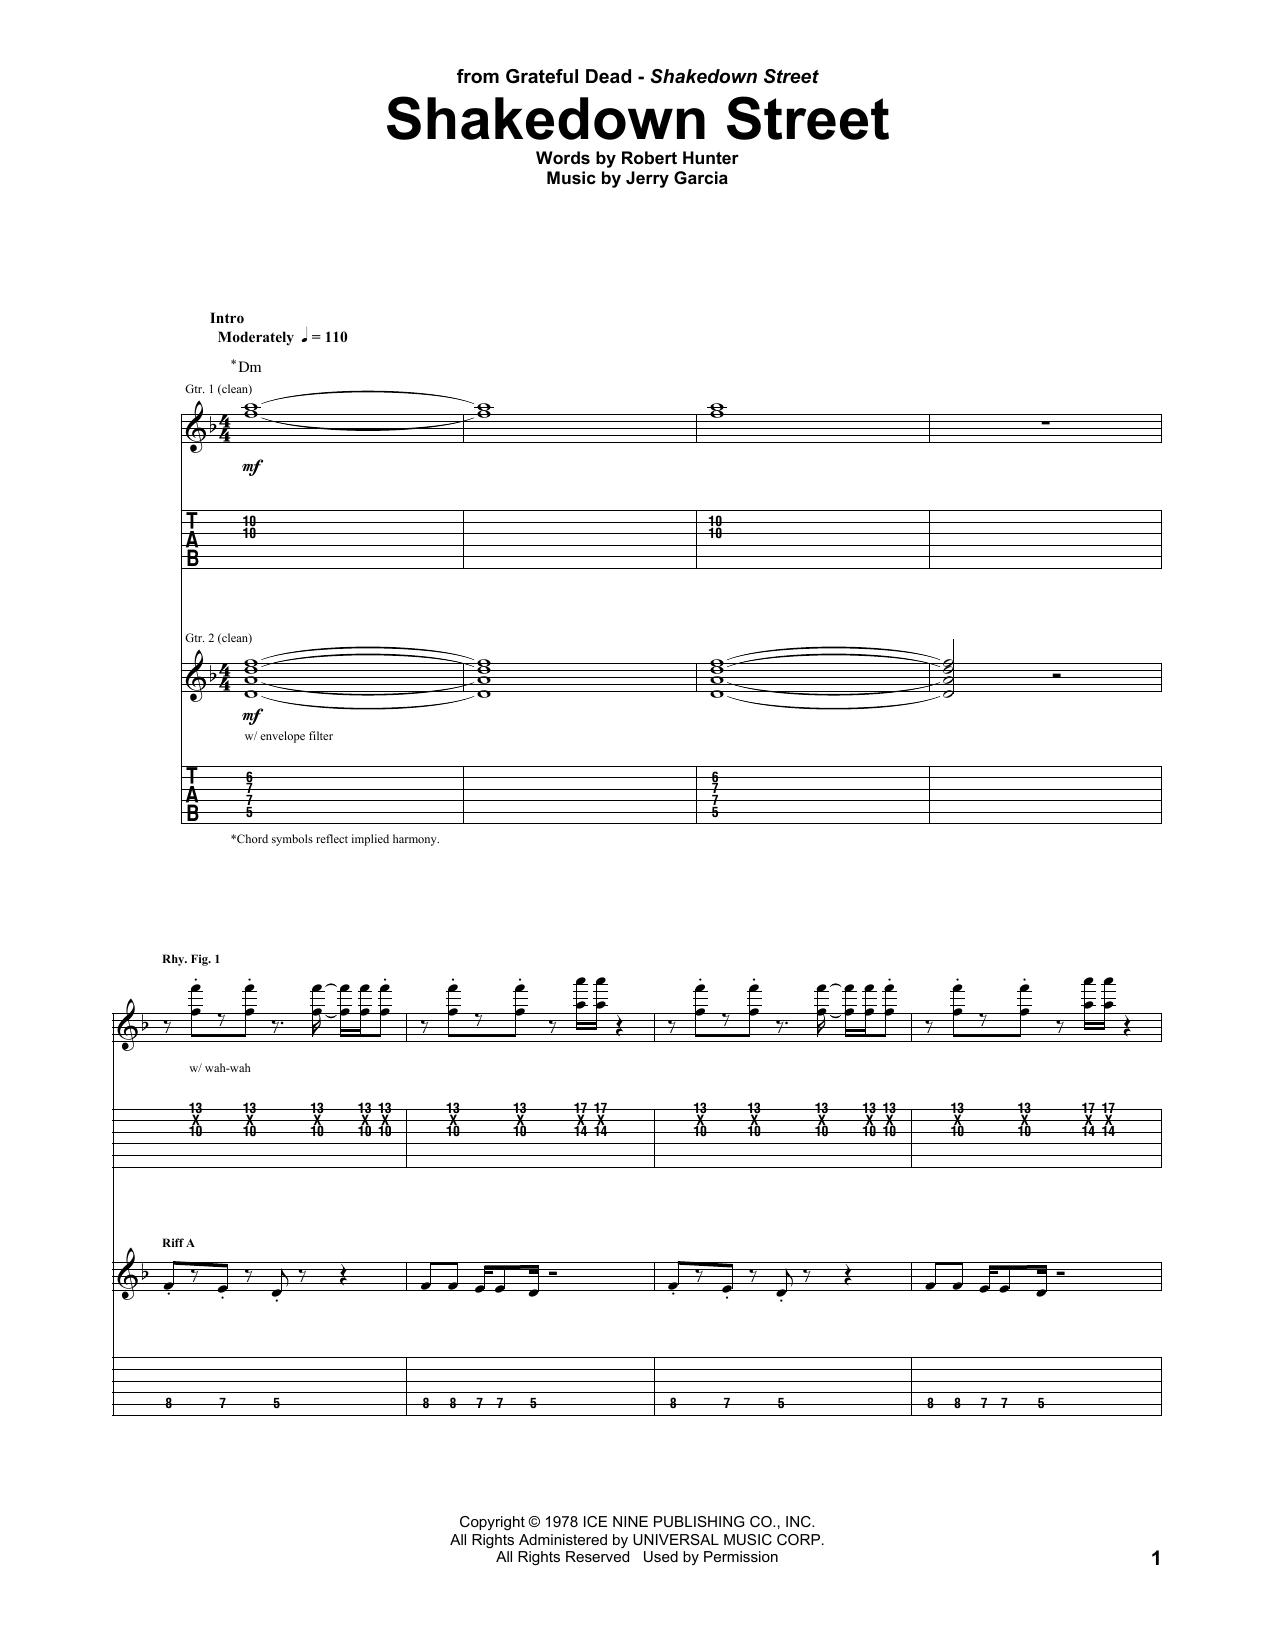 Shakedown street sheet music direct sheet preview hexwebz Choice Image